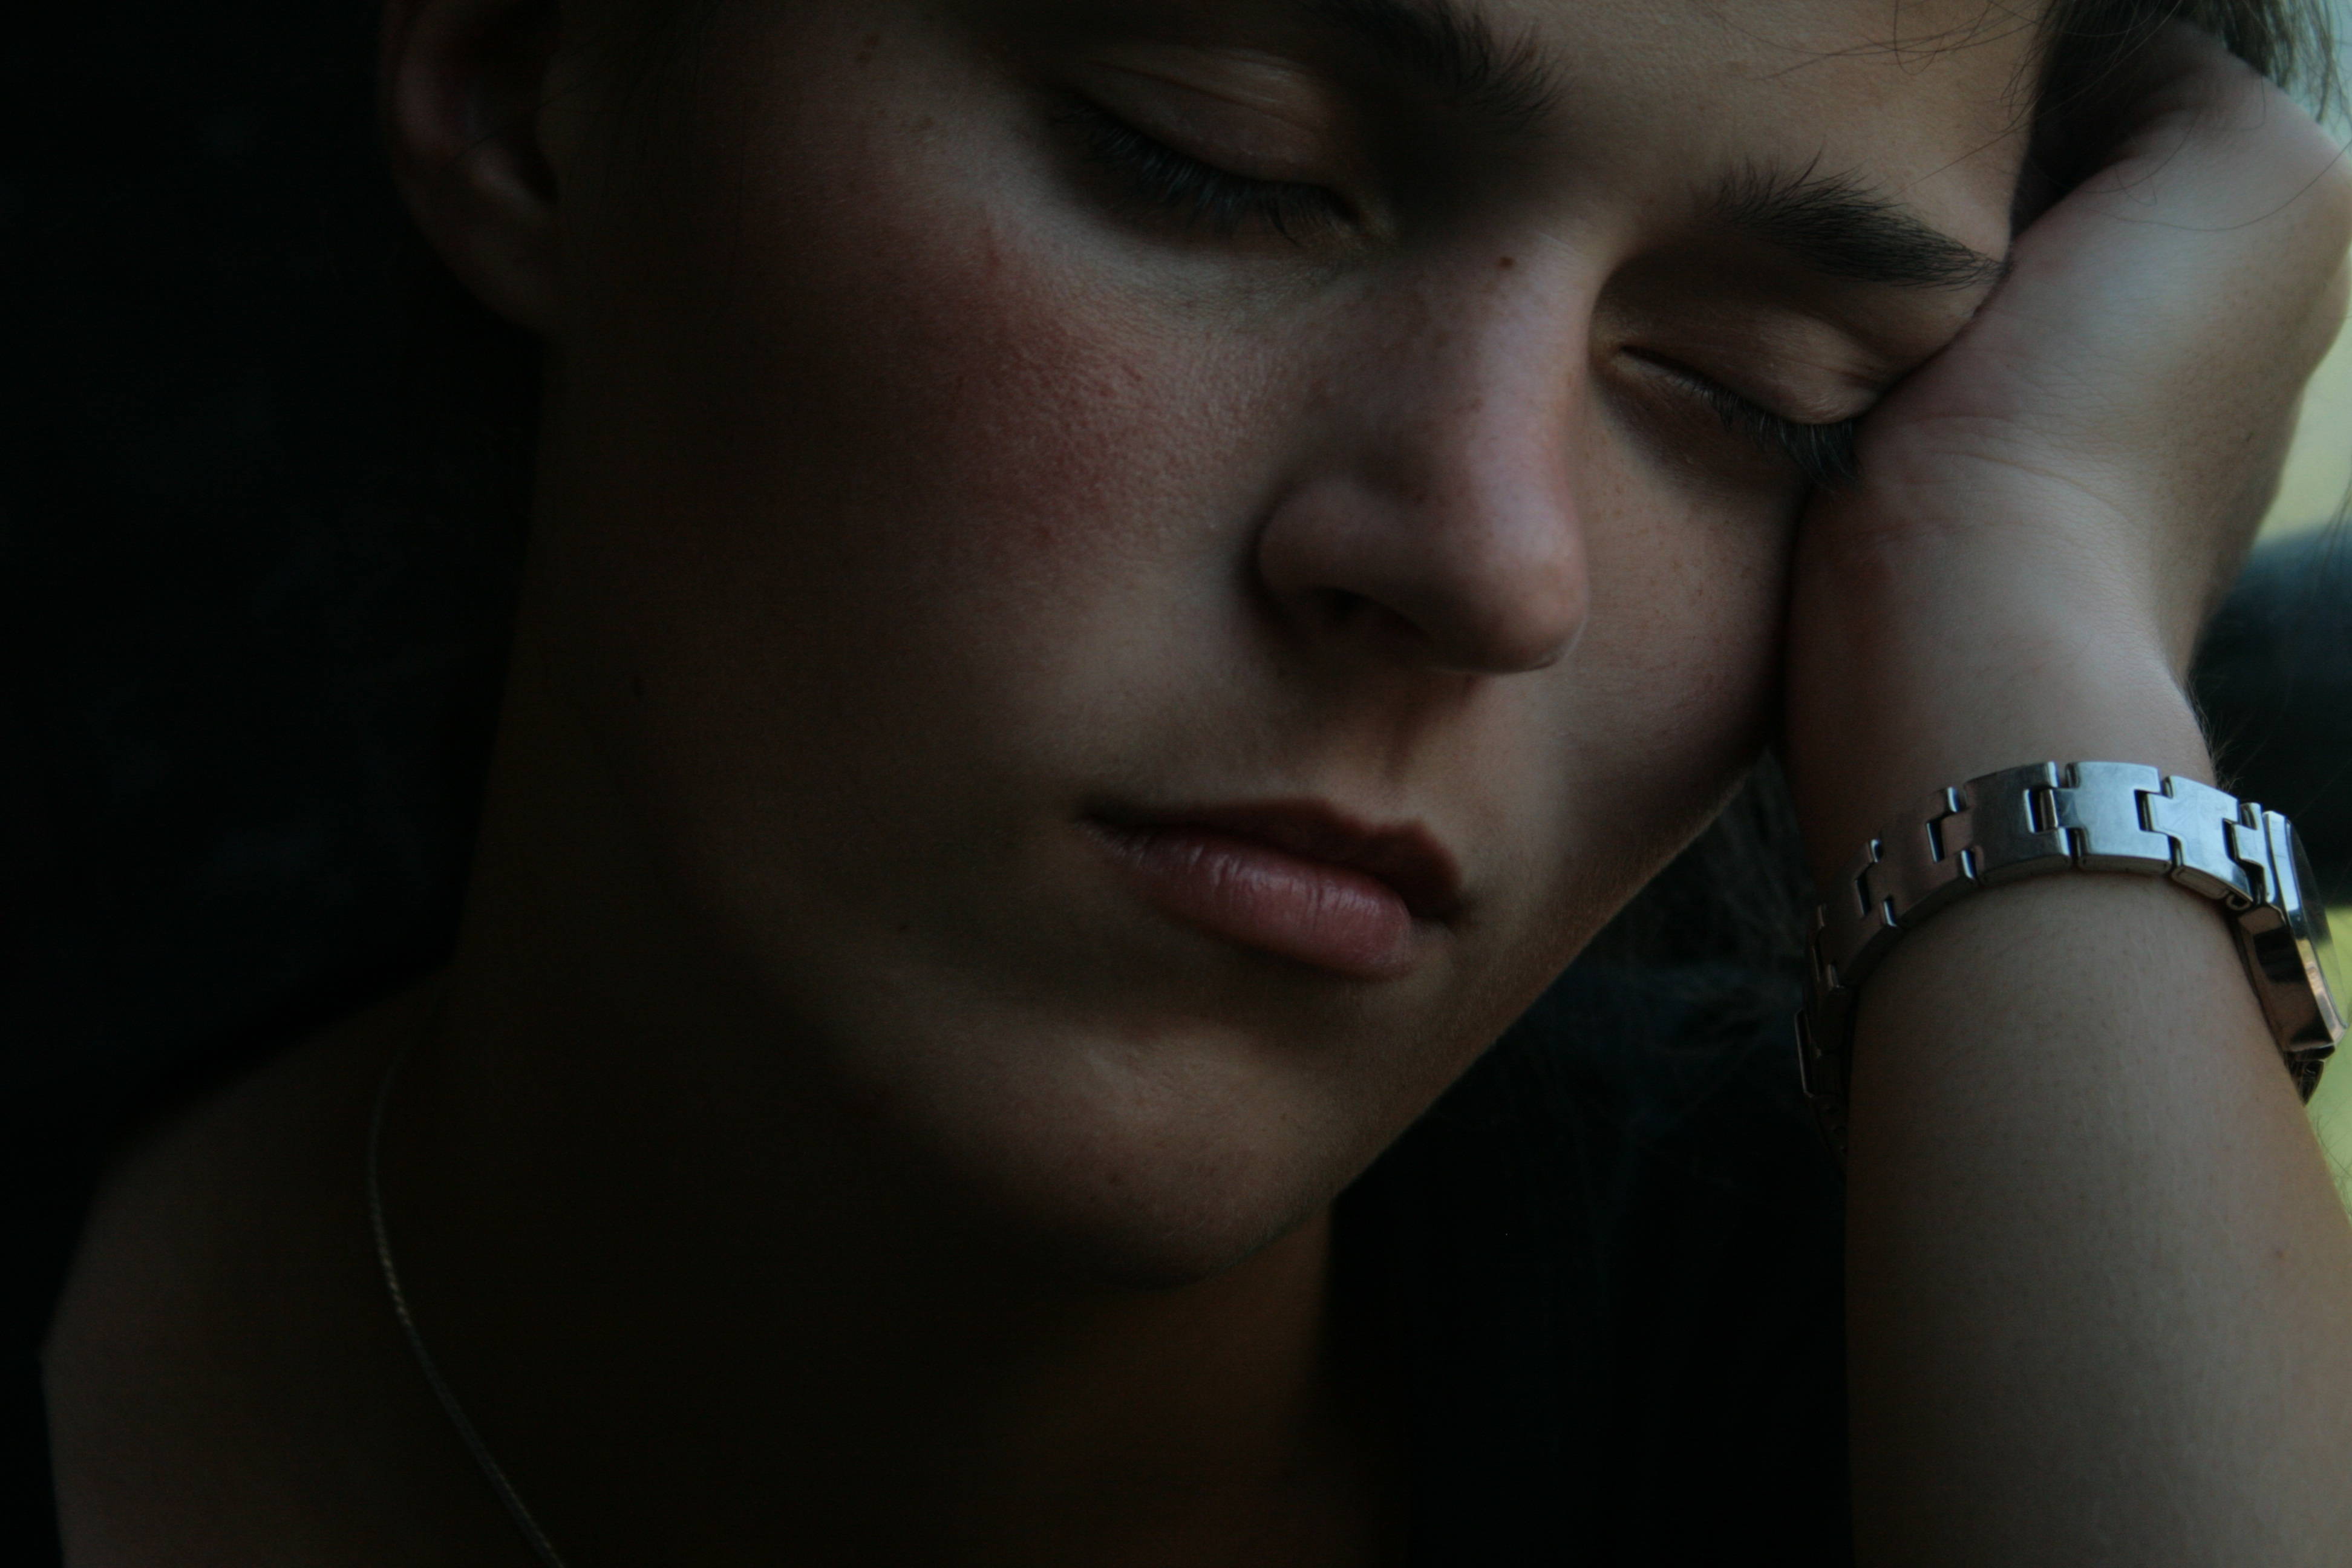 Fatigue/sommeil